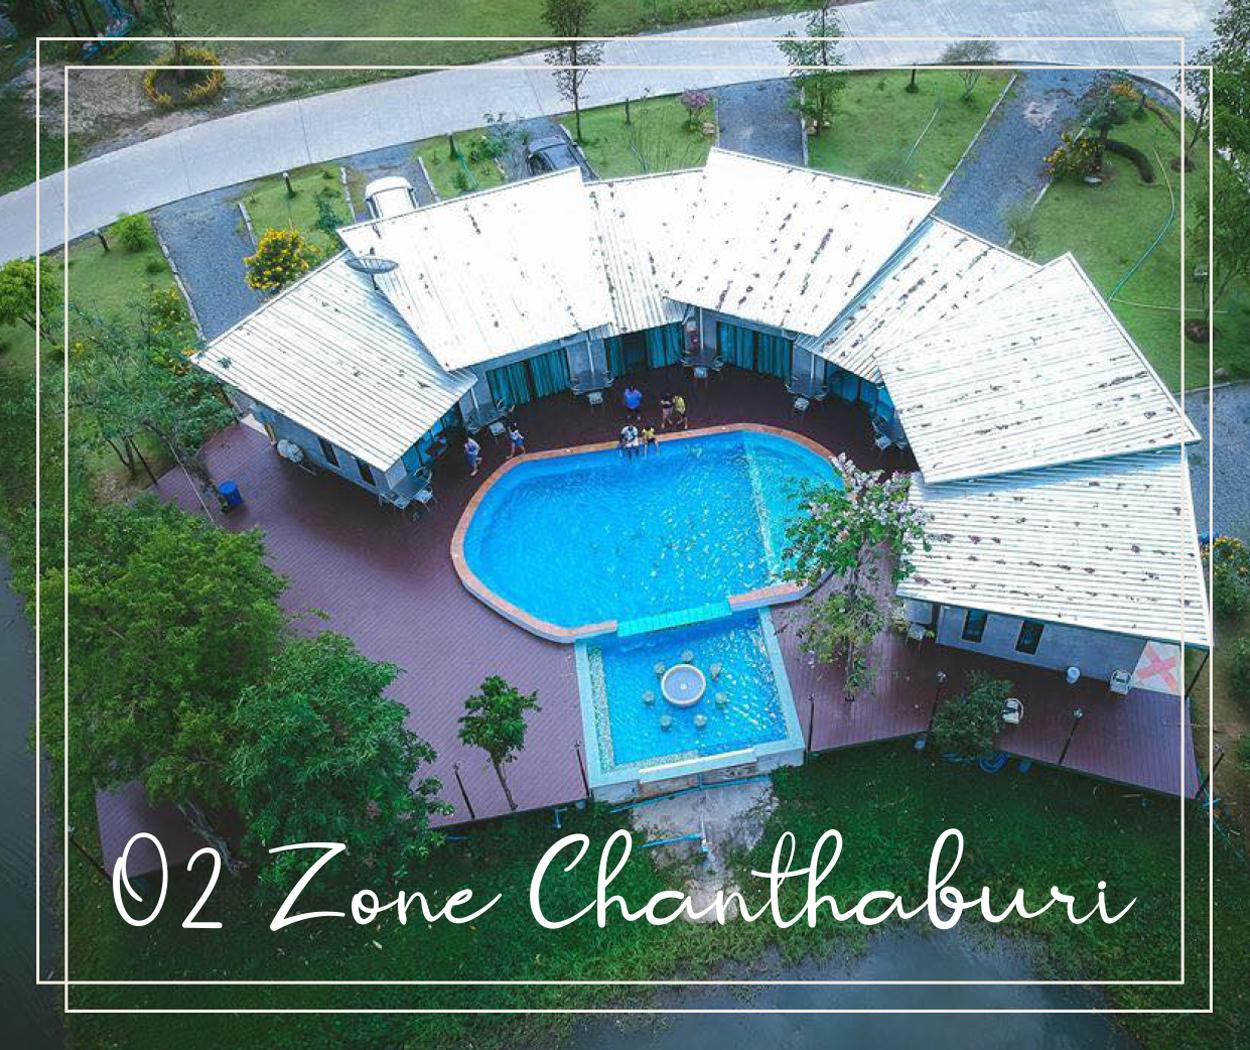 O2 Zone Chanthaburi